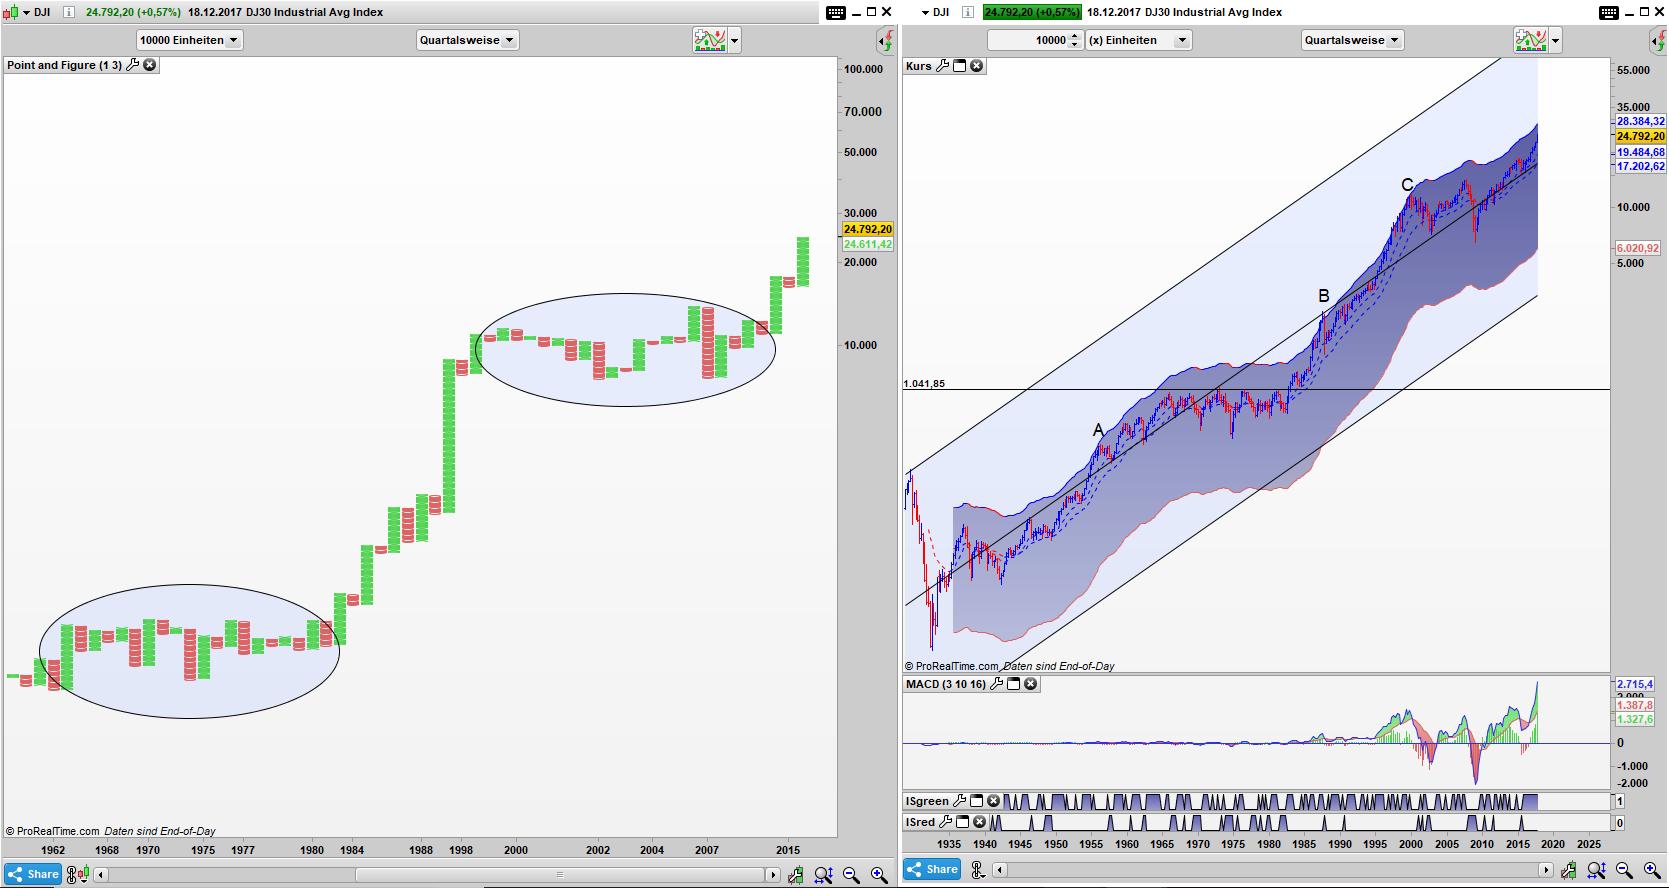 DJI Point and Figure Quartals Chart, Bar Quartals Chart: Kein Ende in Sicht?